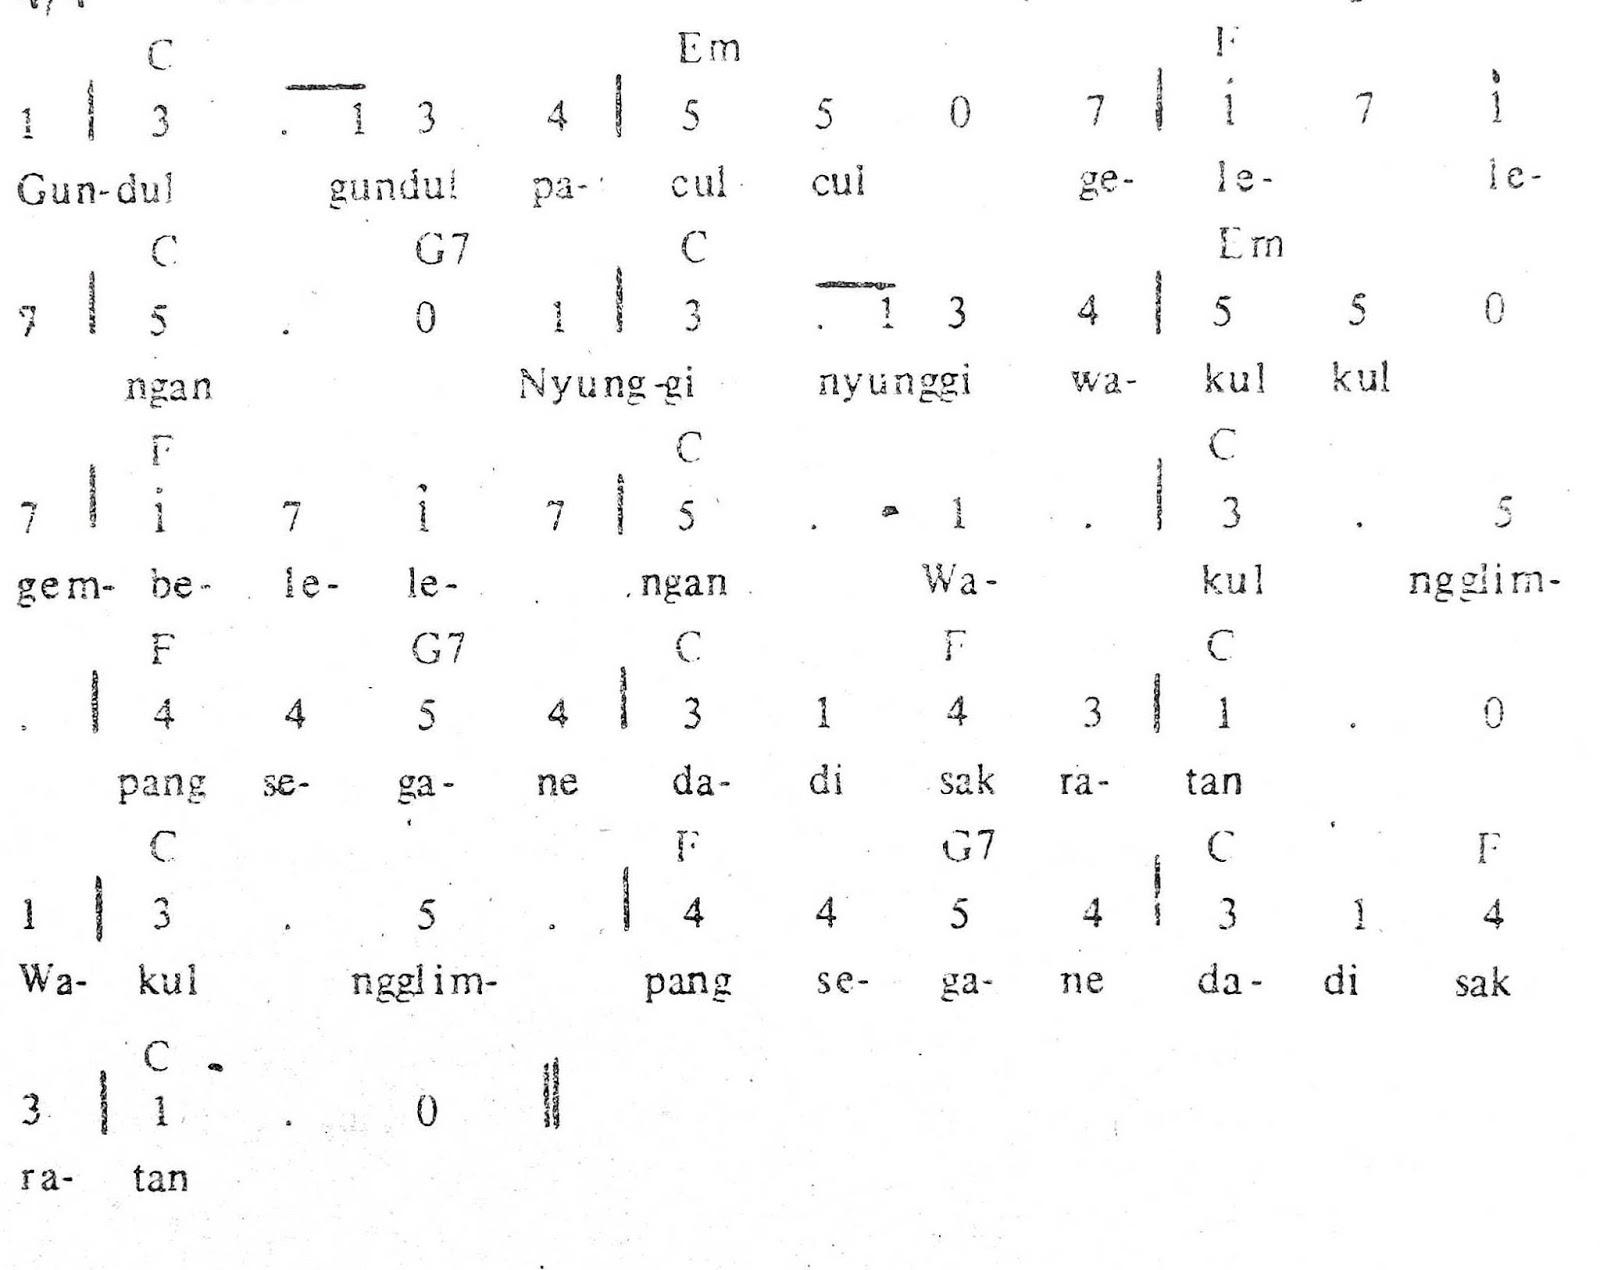 Chord & Arti Lirik Lagu Jawa Tengah: Gundul Pacul + Not Angka